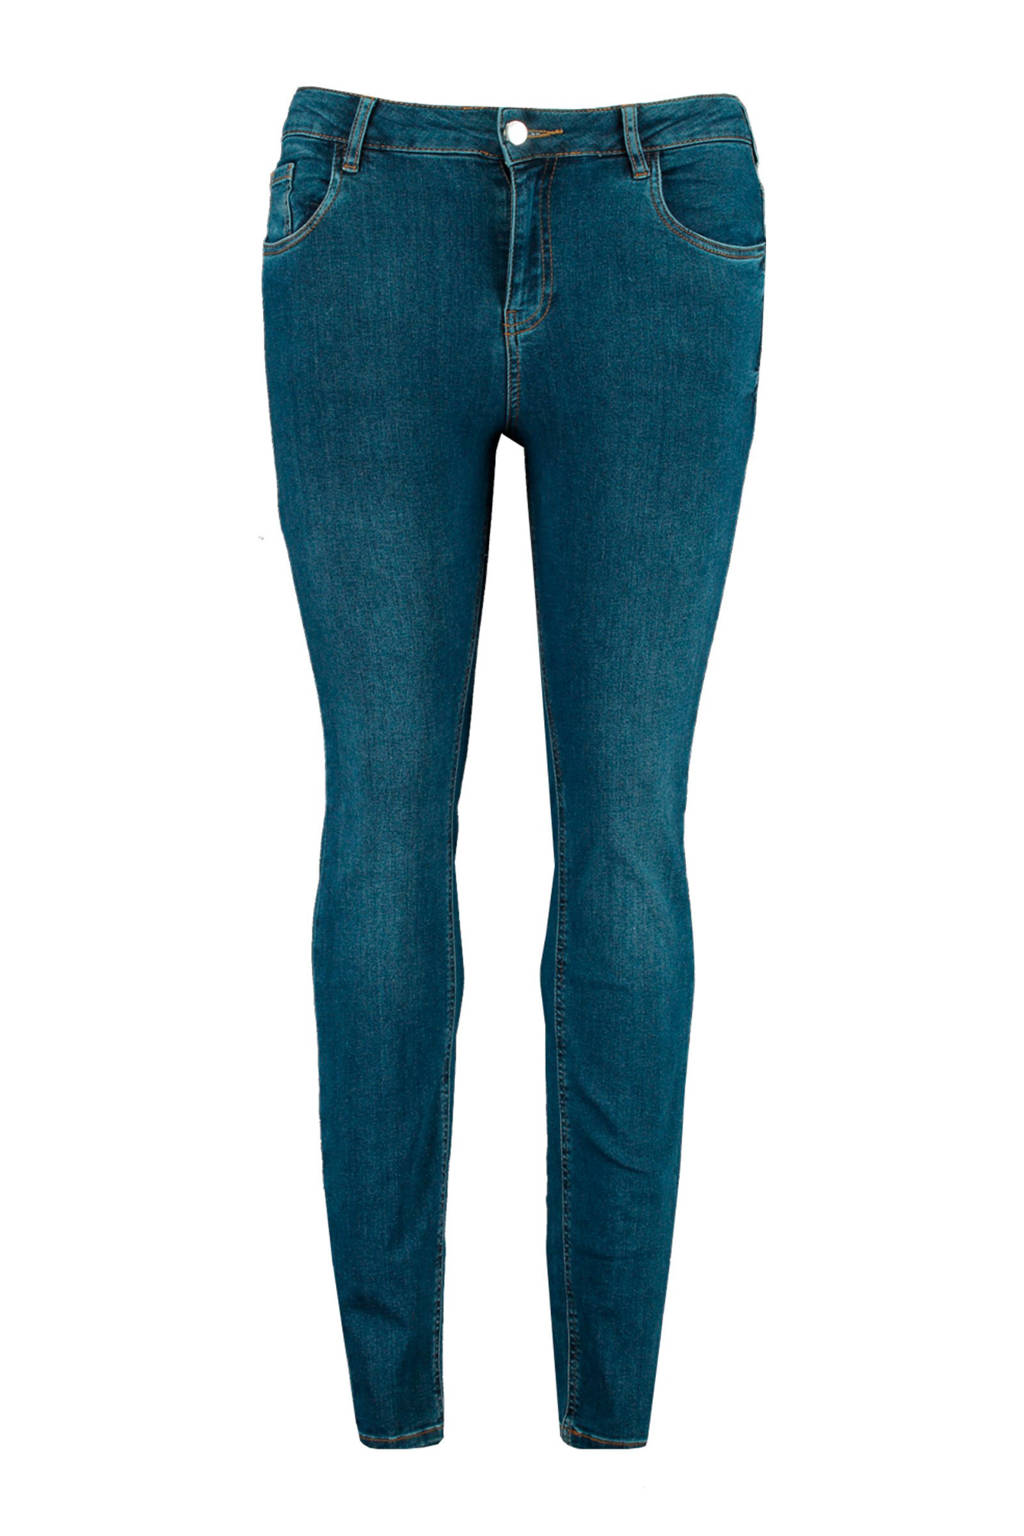 MS Mode high waist skinny jeans stonewash denim, Stonewash Denim